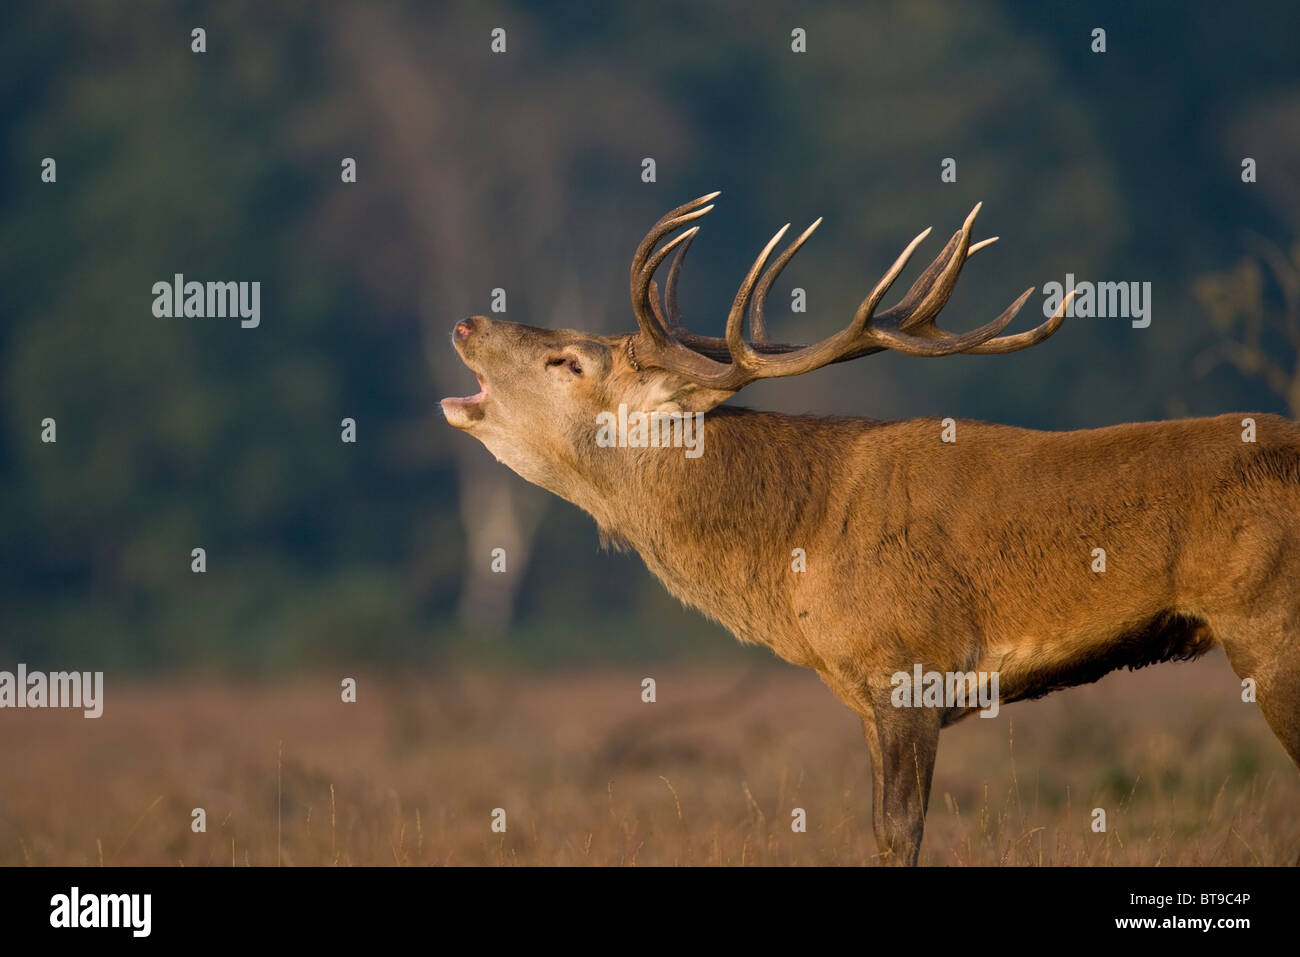 Red deer stag roars during the rut (Cervus elaphus). New Forest, England. - Stock Image